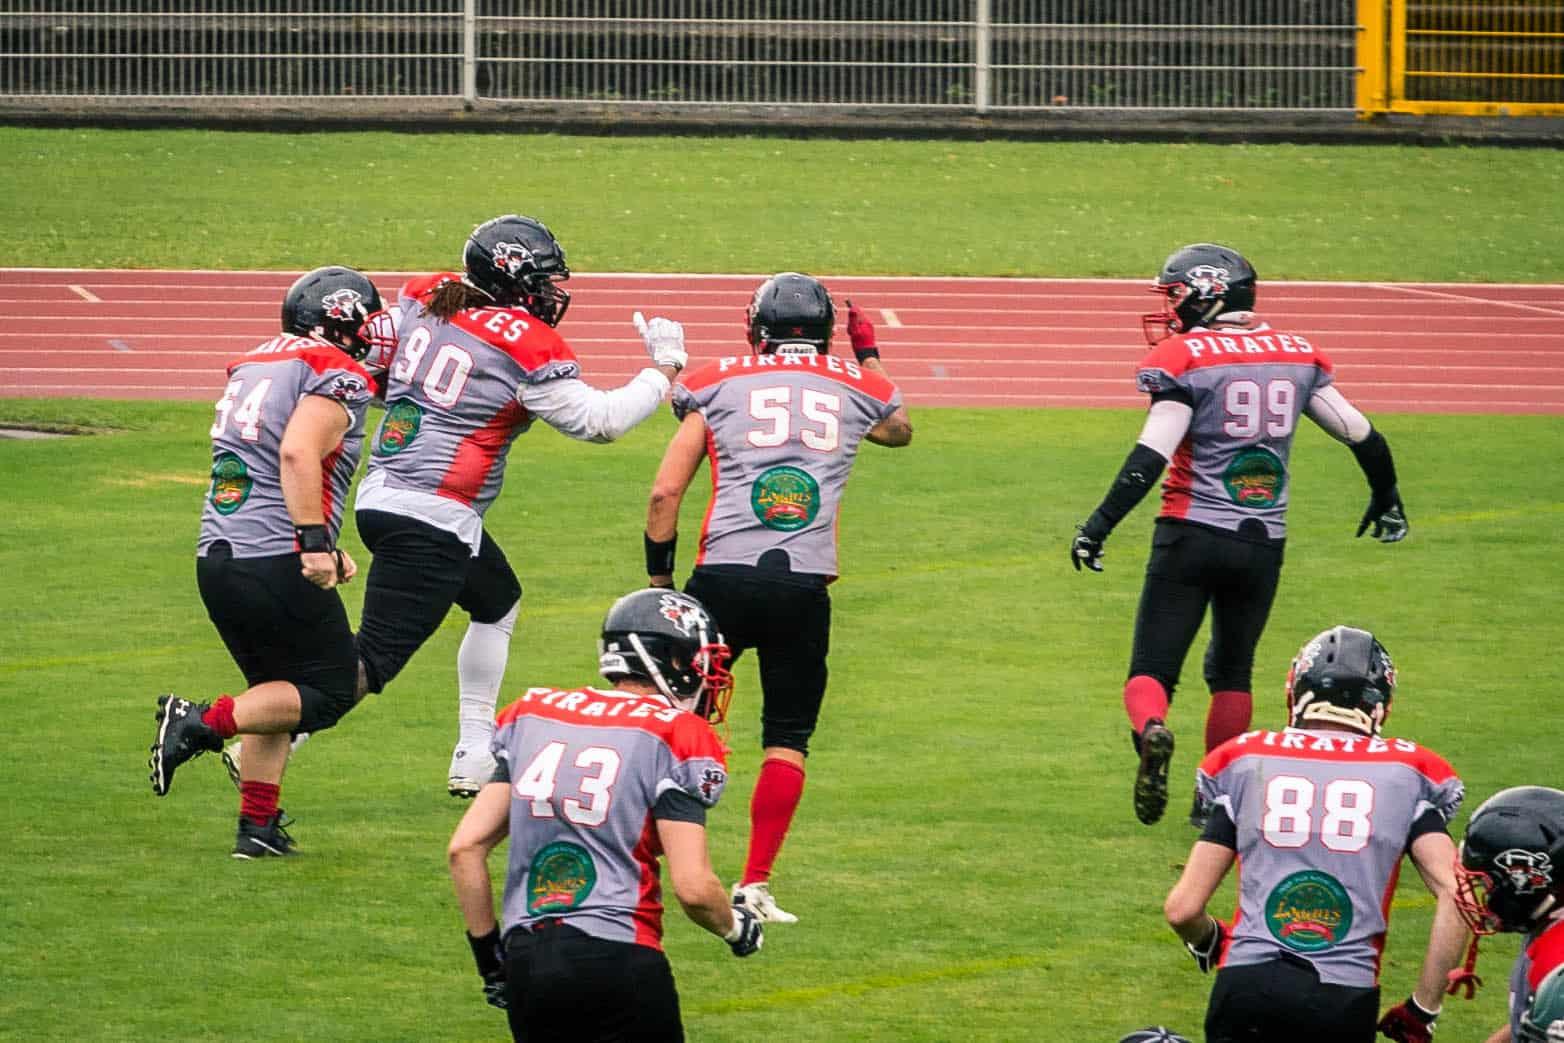 Konstanz Pirates - American Football - Miners Fumble